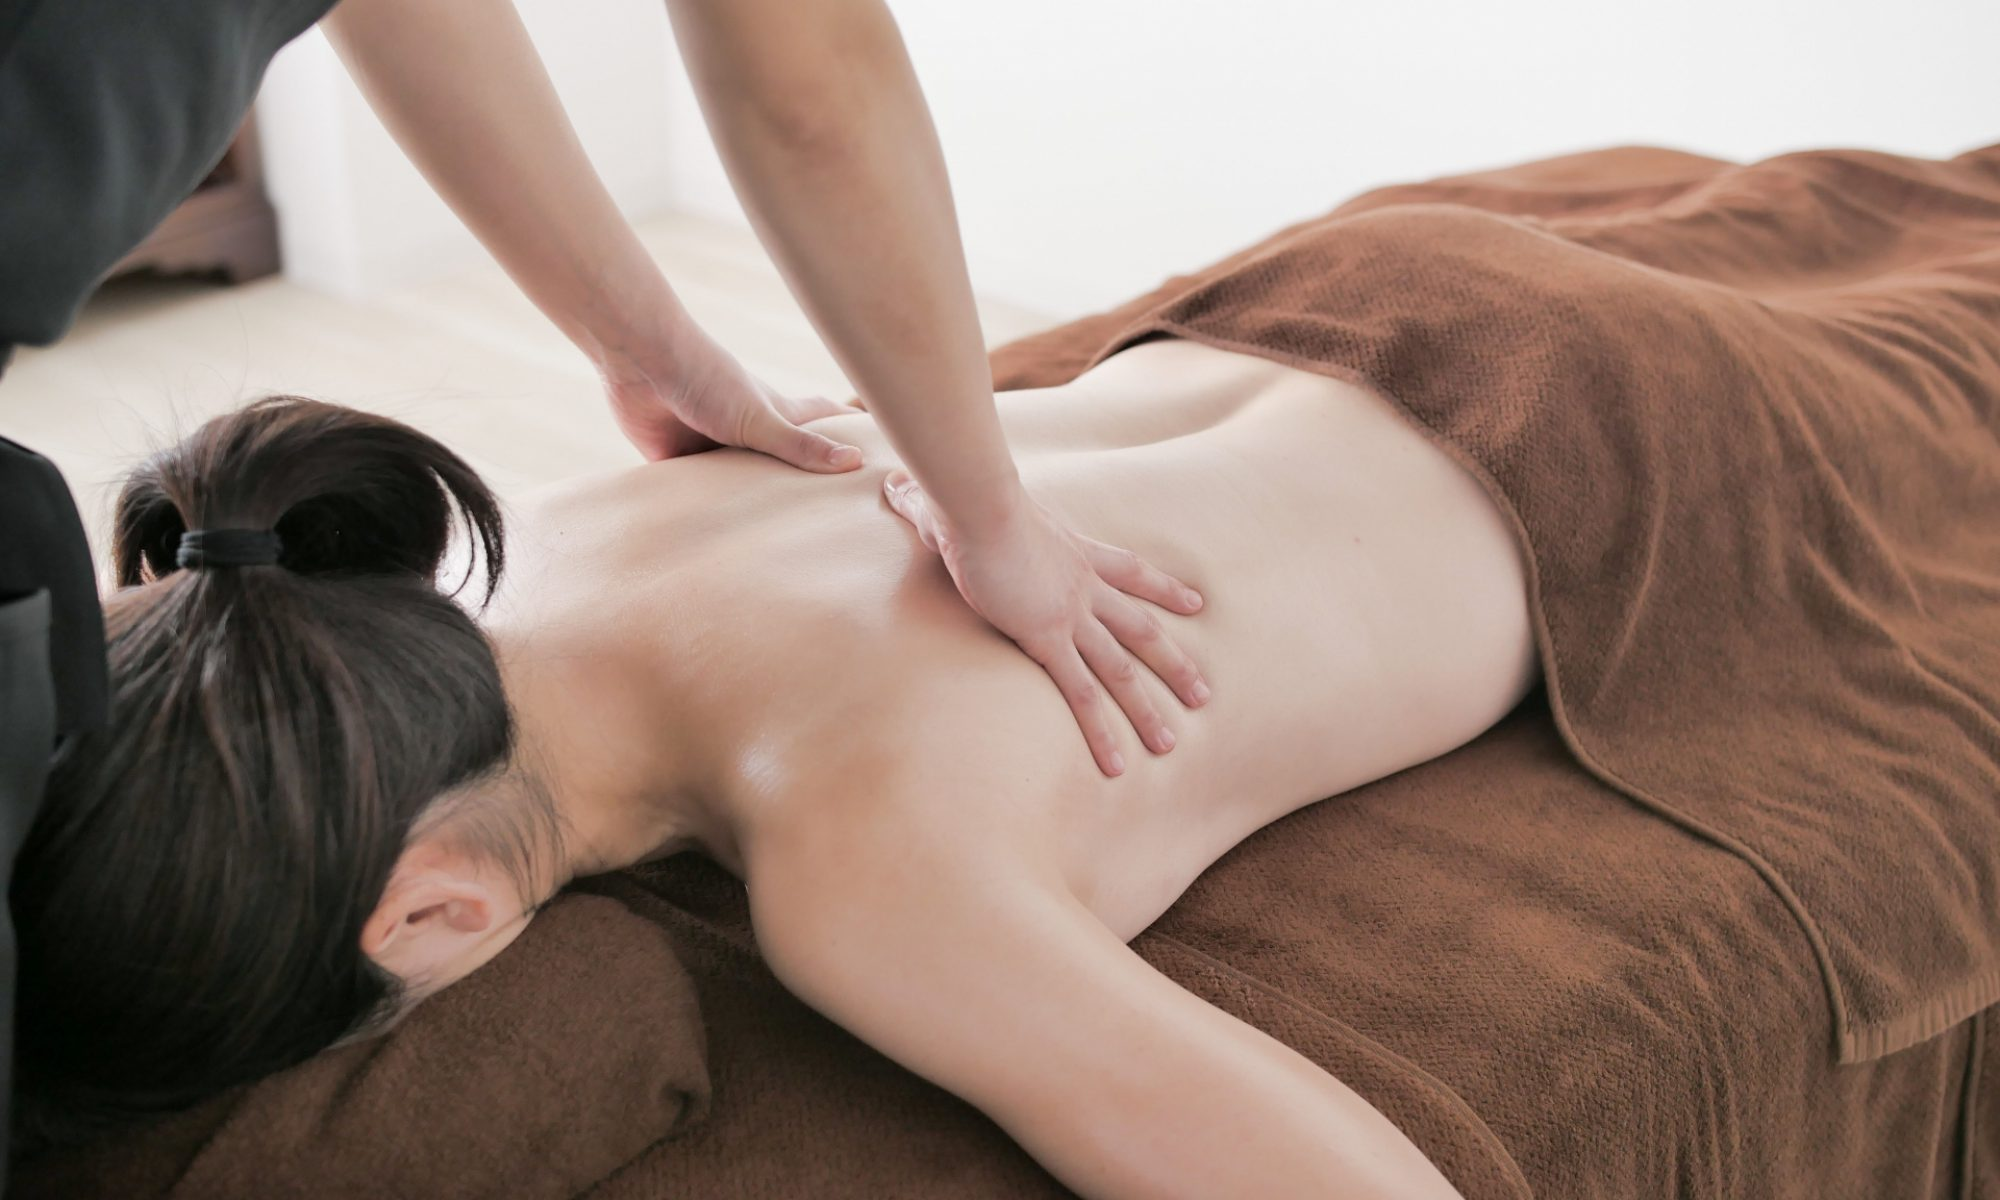 Healing Bodycare kokokara